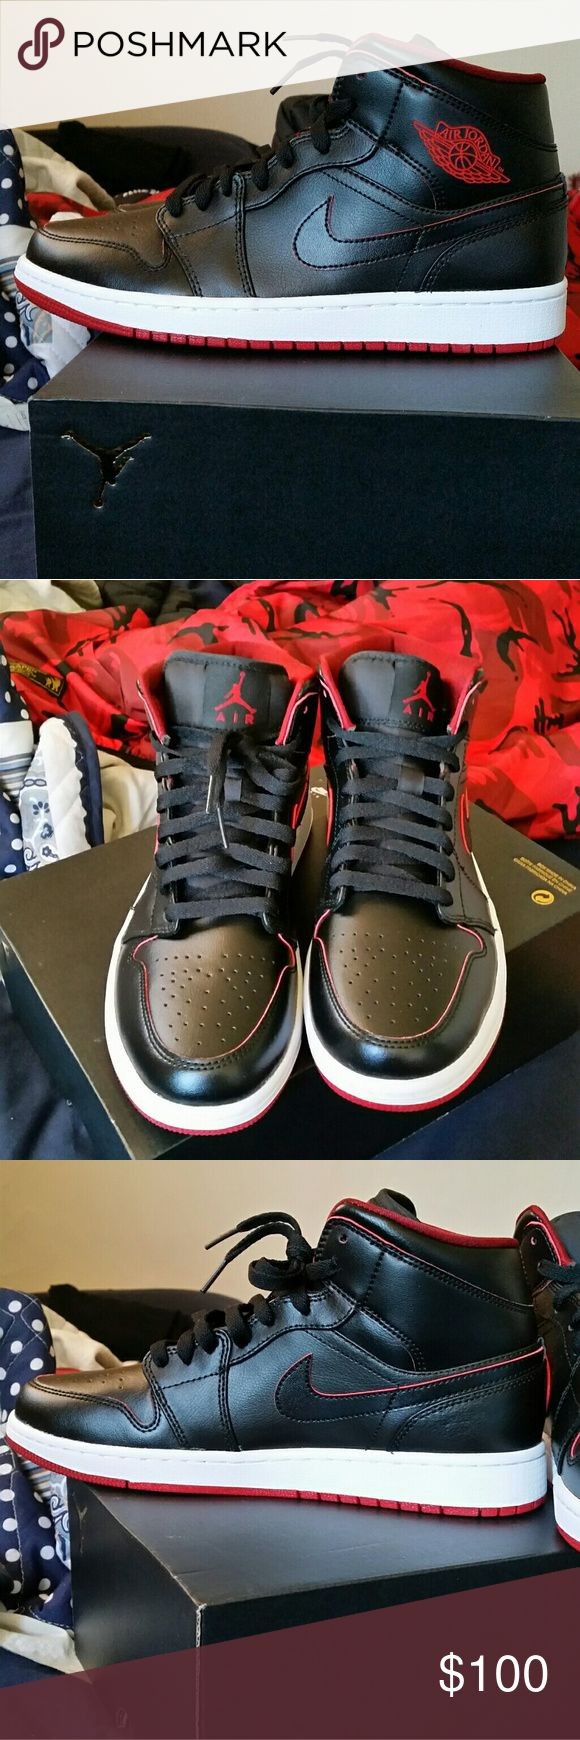 Nike air jordan 1s Brand new. The color is reddish-burgundy and black. 100% authentic Jordan Shoes Sneakers